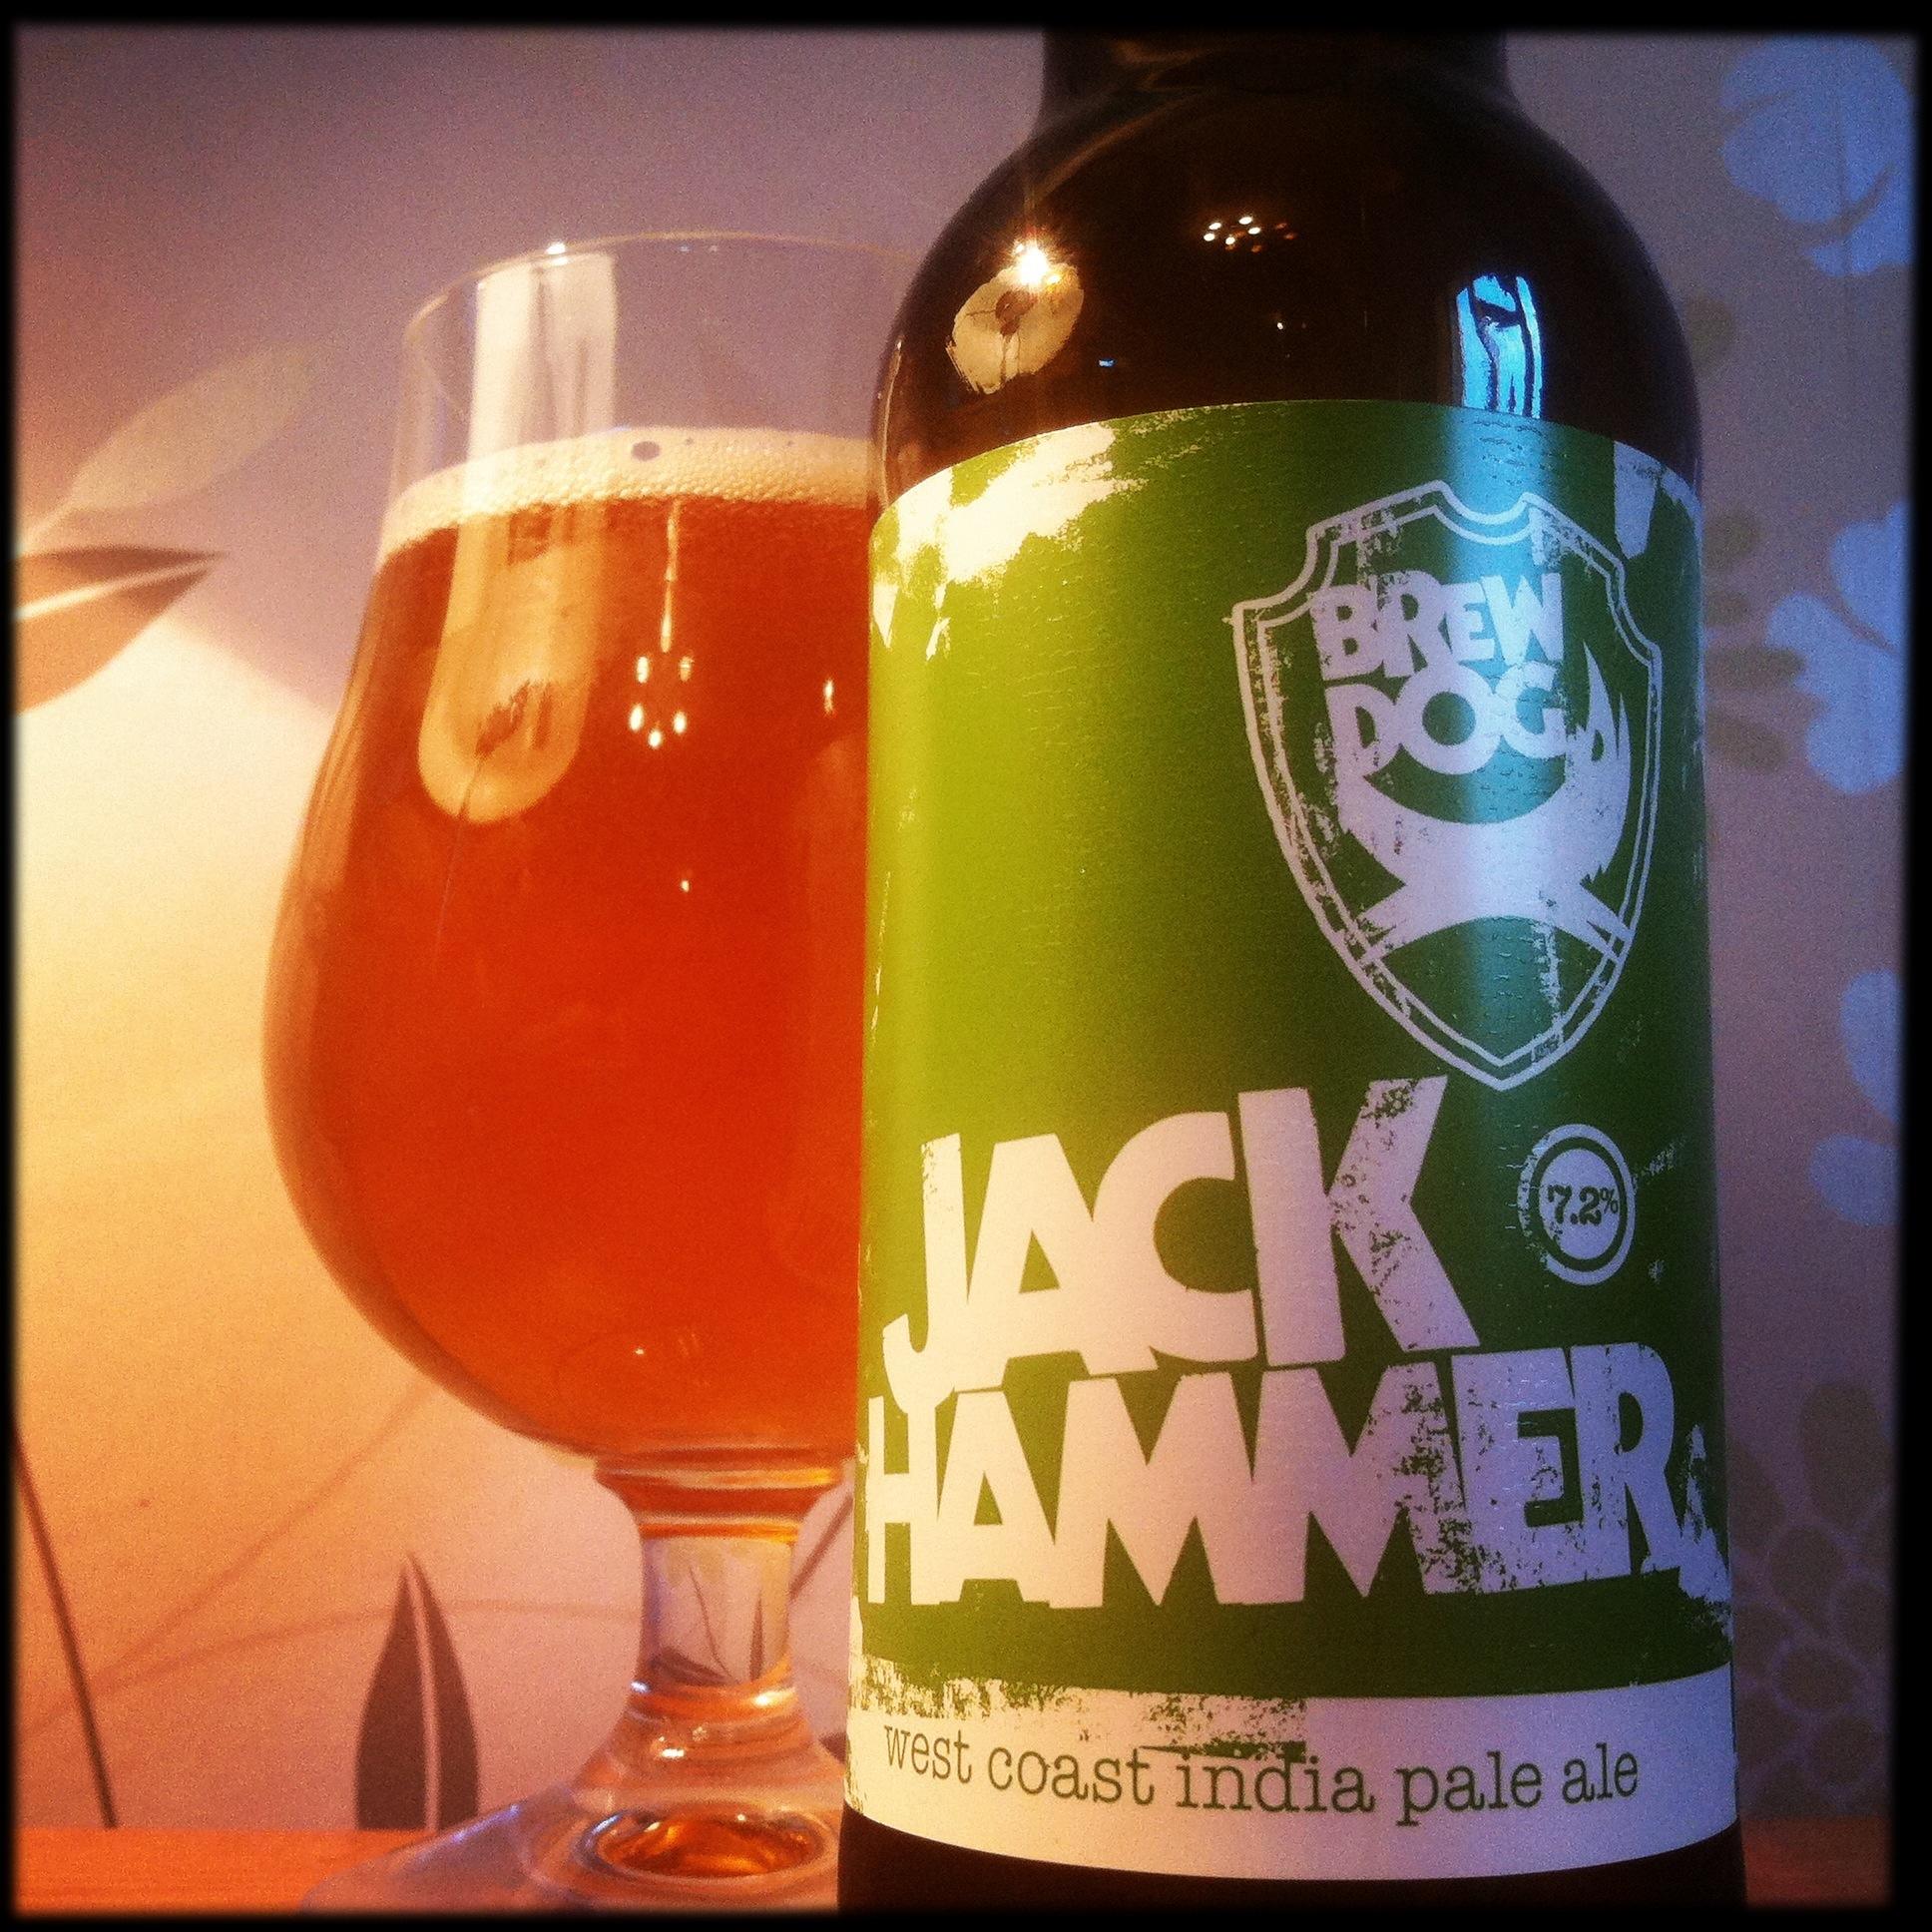 jack hammer brewdog